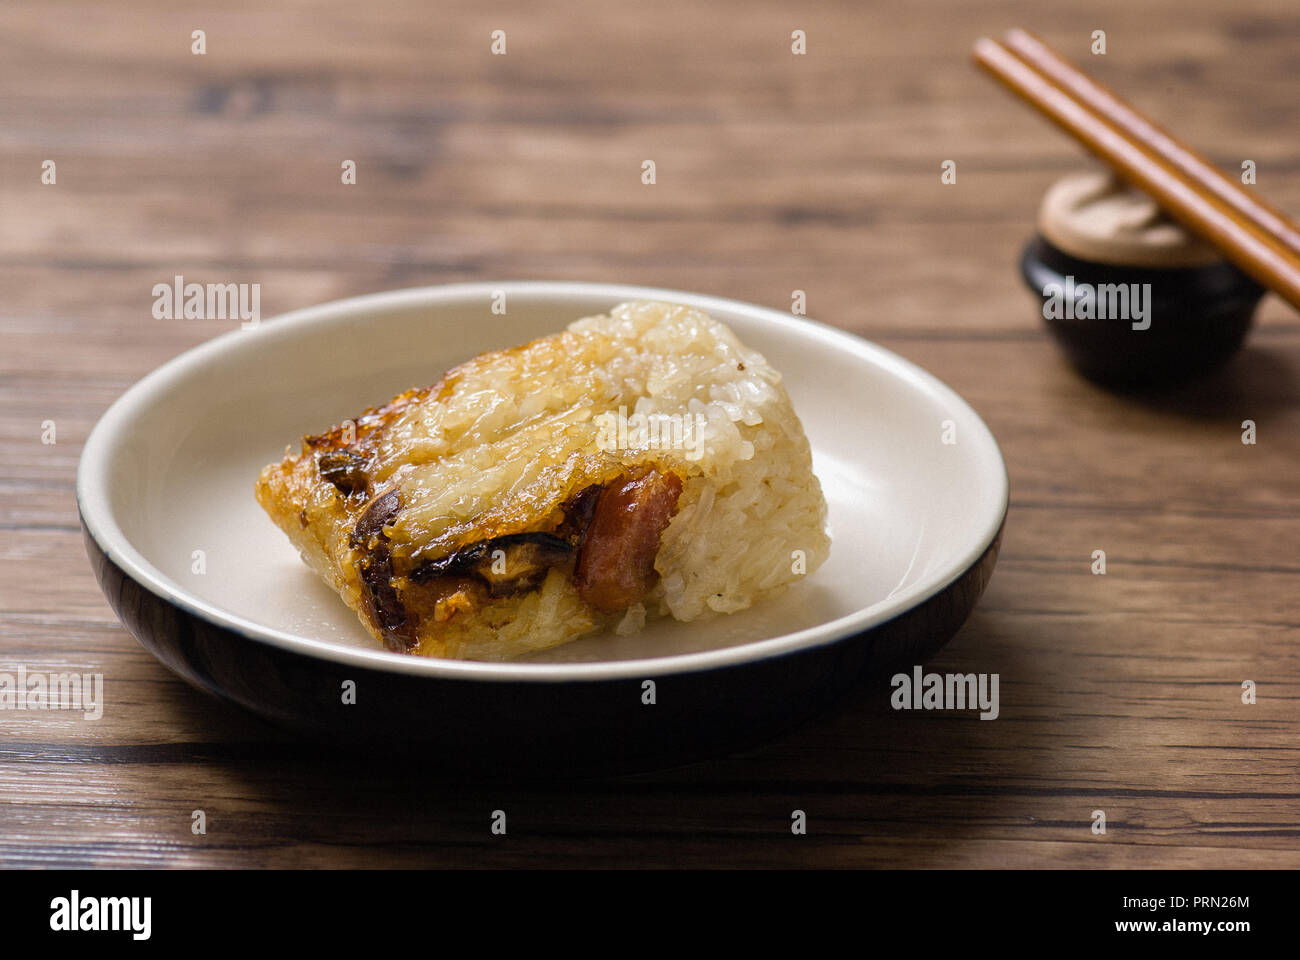 Food glutinous rice chicken Stock Photo